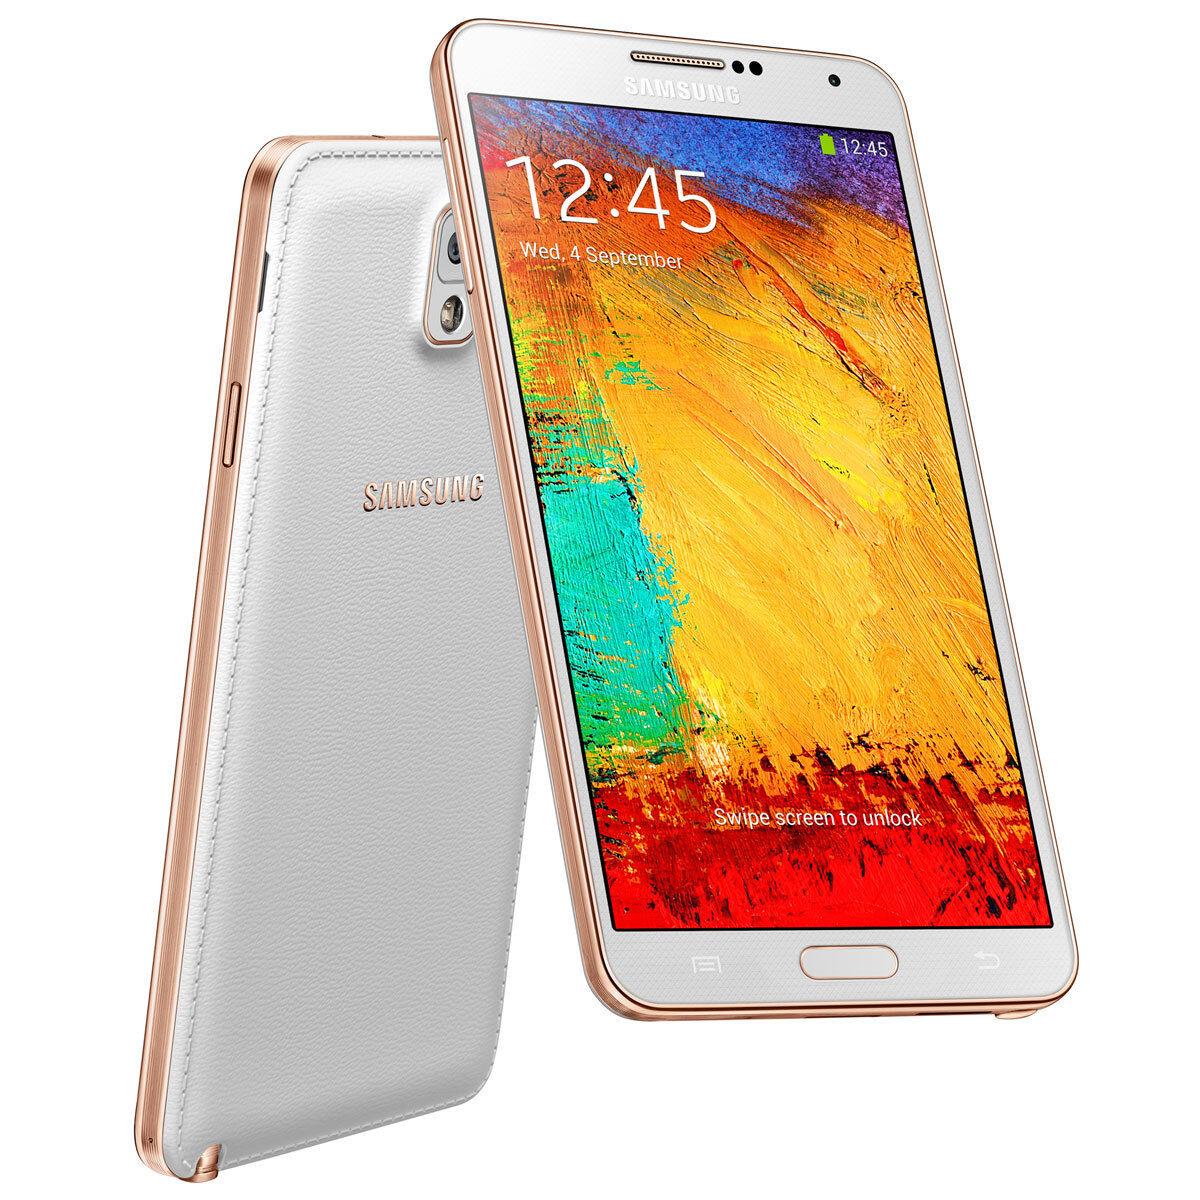 Samsung N900 Galaxy Note 3 32GB Verizon Wireless 4G LTE Android WiFi Smartphone